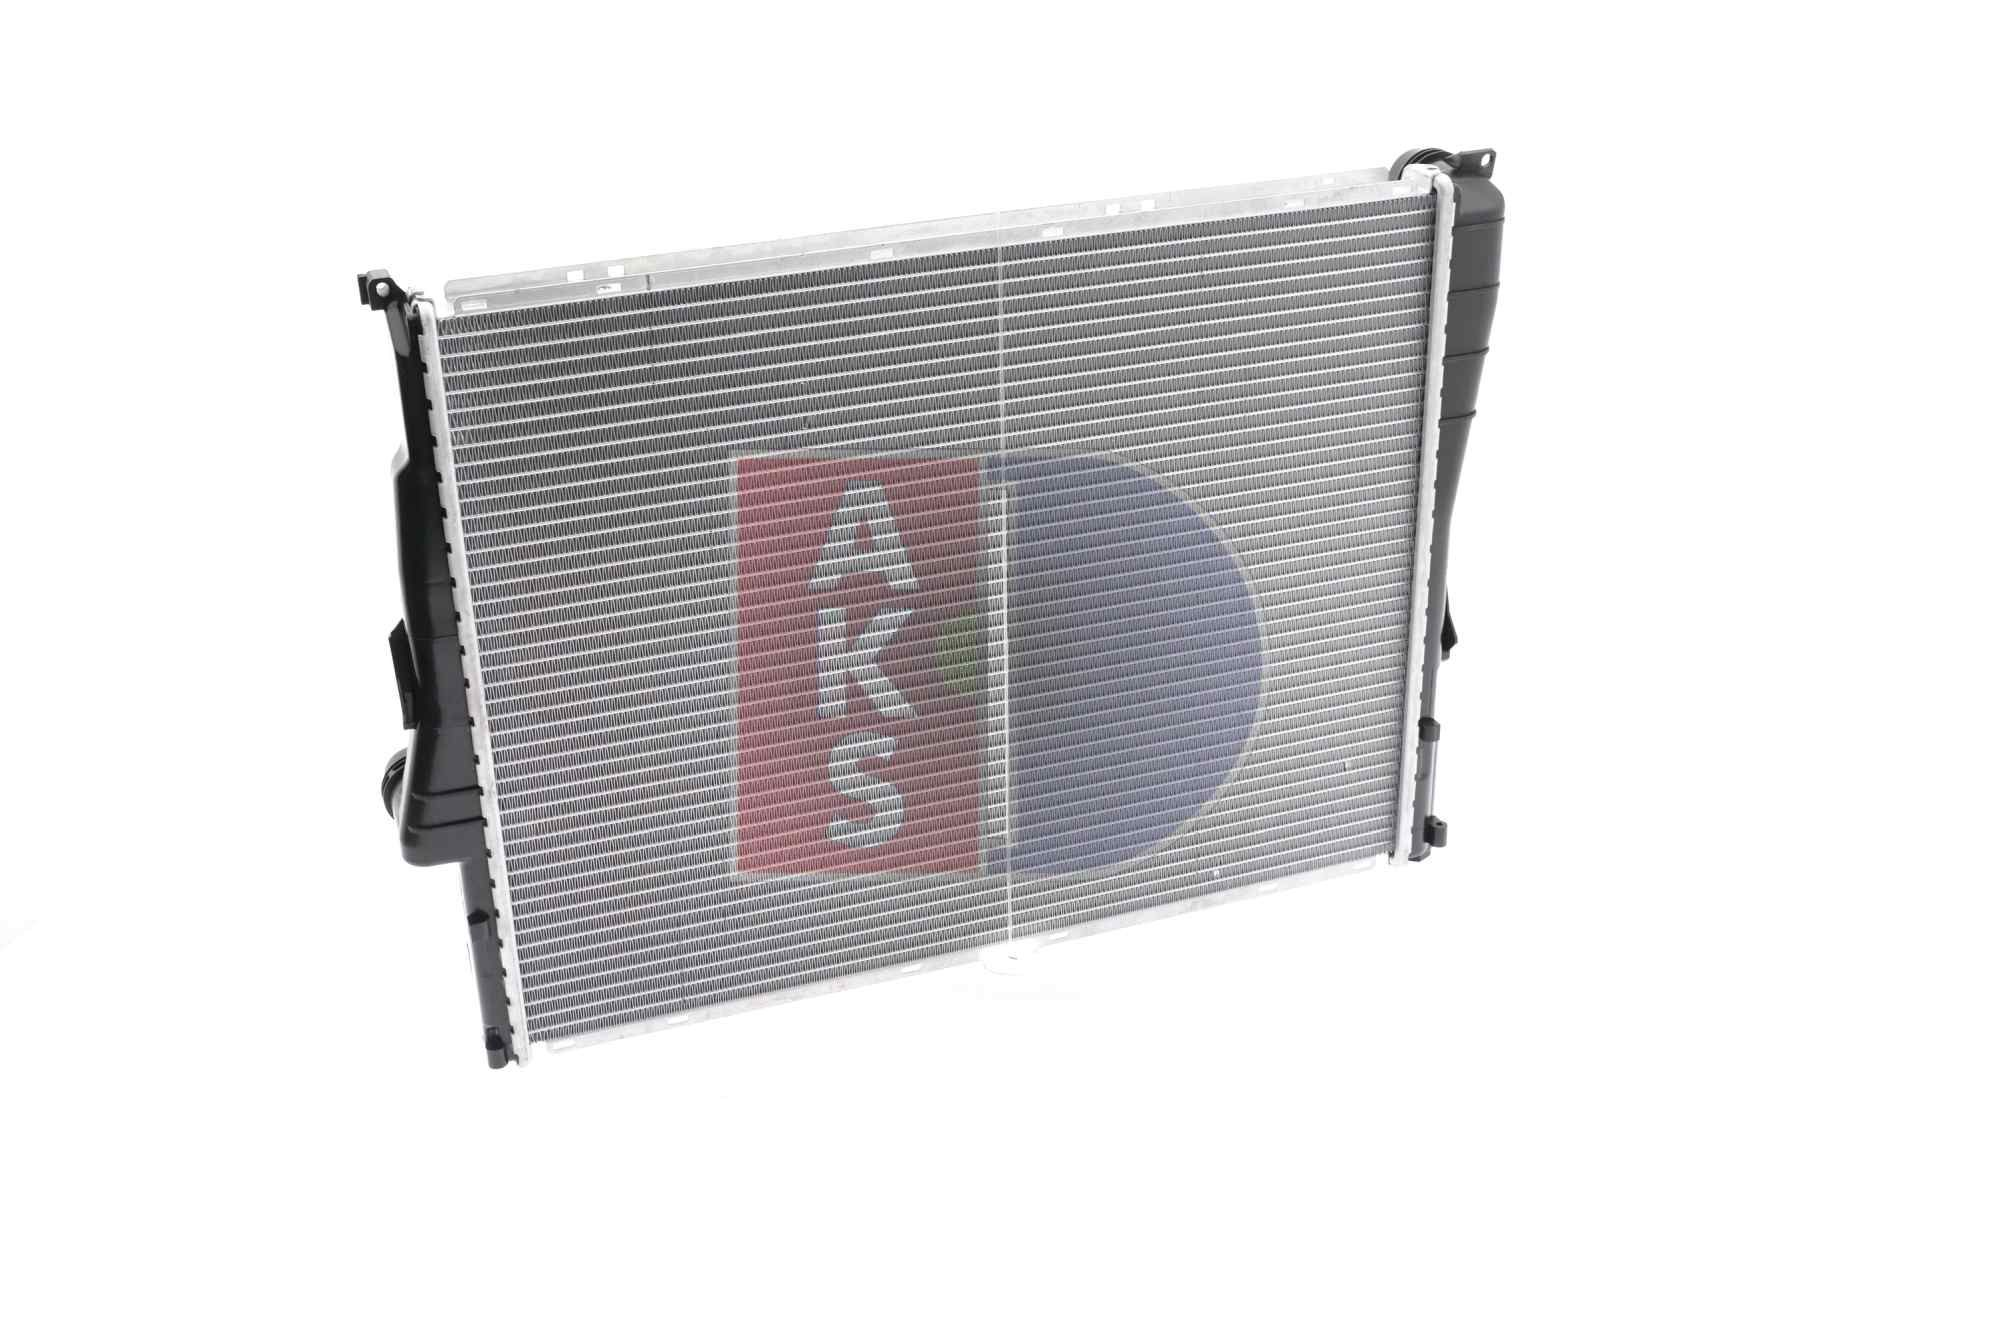 Kühler, Motorkühlung 050004N von AKS DASIS